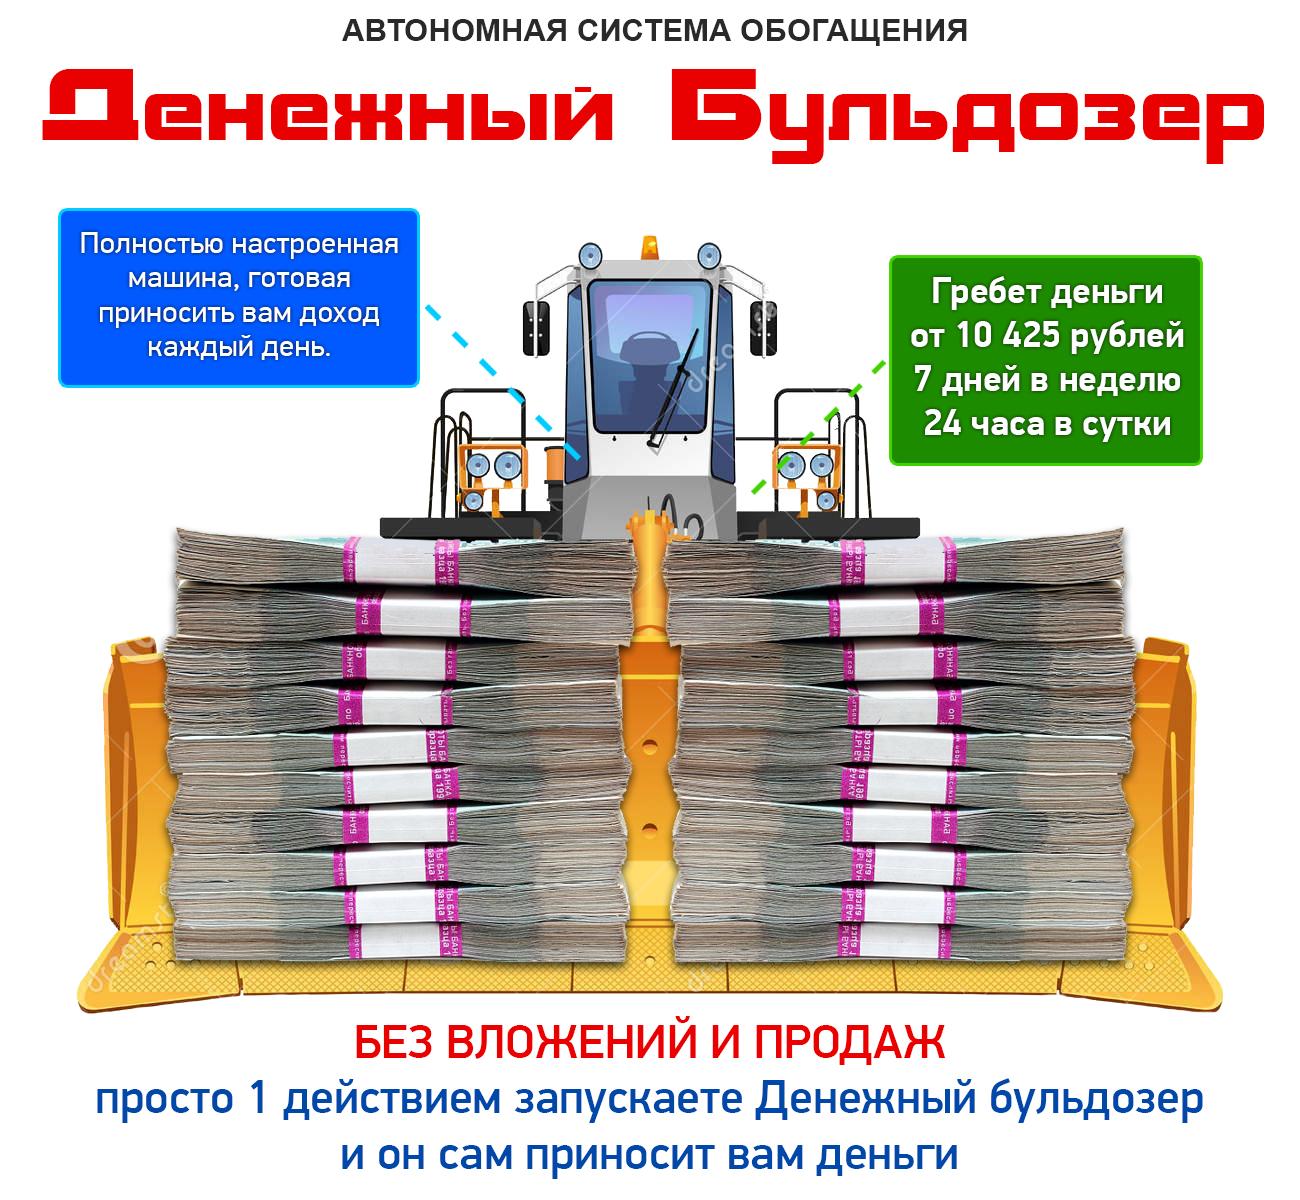 http://u1.platformalp.ru/39871d0cee6ab3debf7e05cd7a6d5cf4/a28944c9a38e1487b0be018634cc7c23.jpg